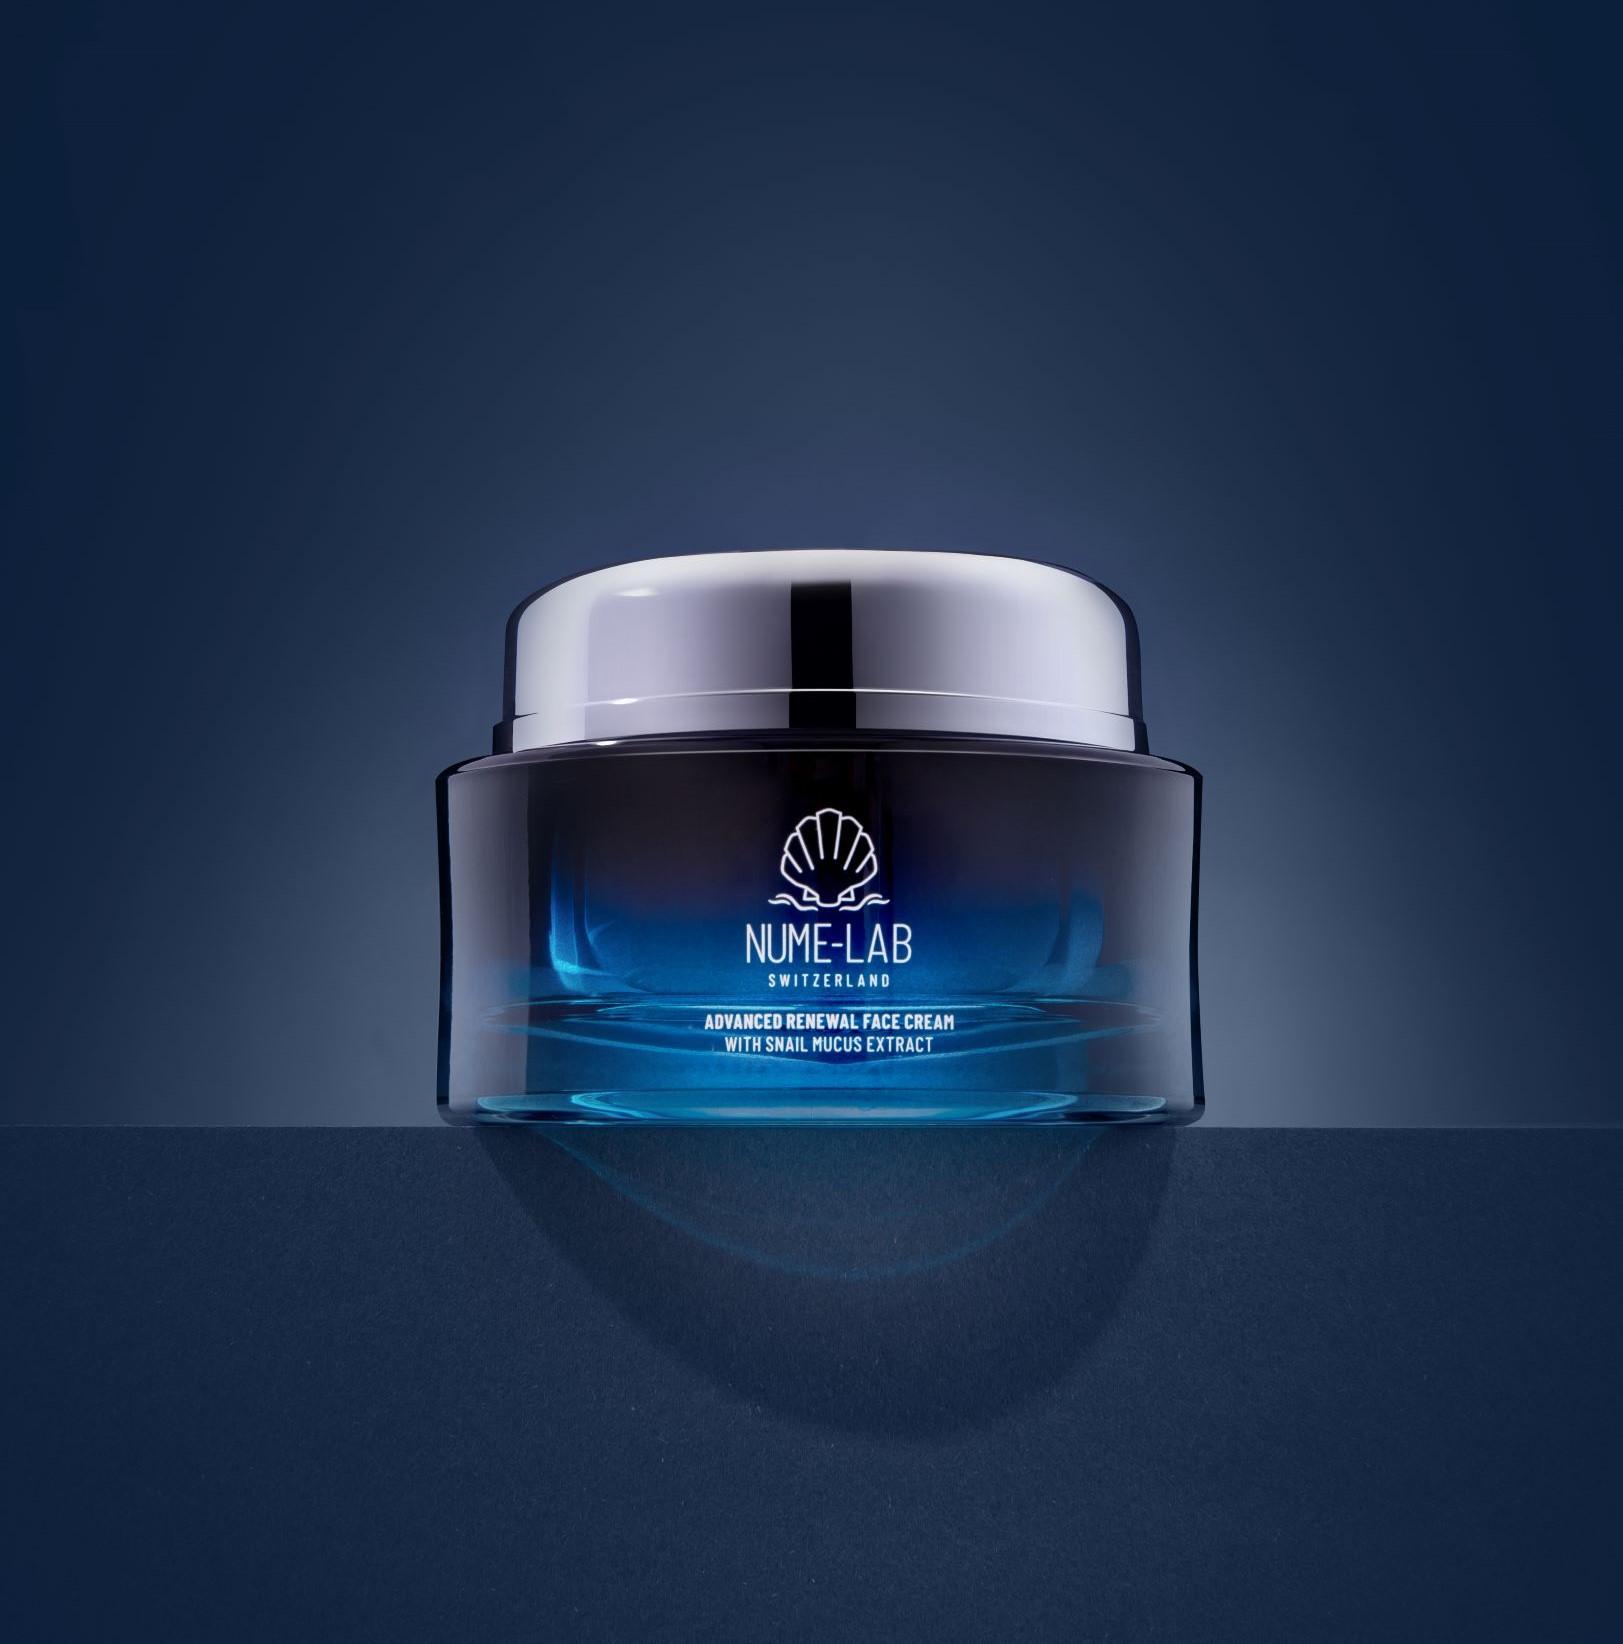 NUME-Lab Advanced Renewal Face Cream